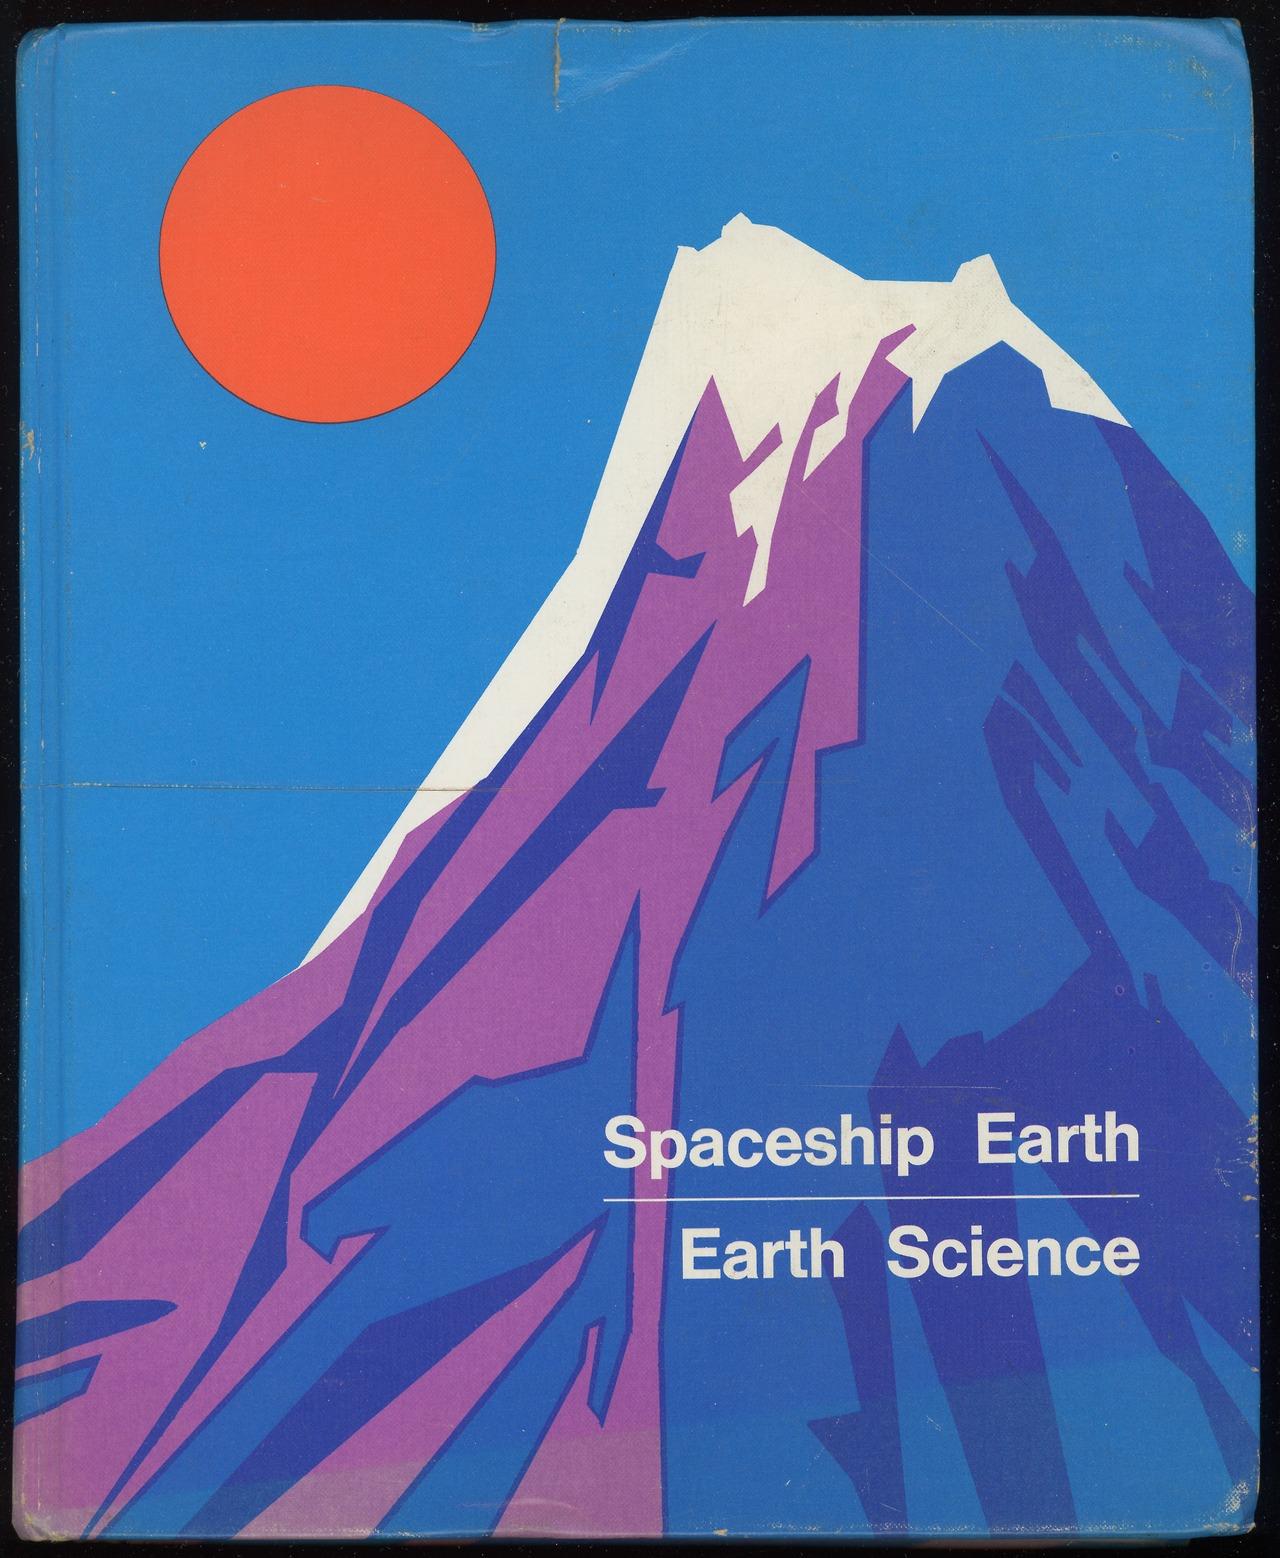 Earth Sciences: Spaceship Earth: Earth Science